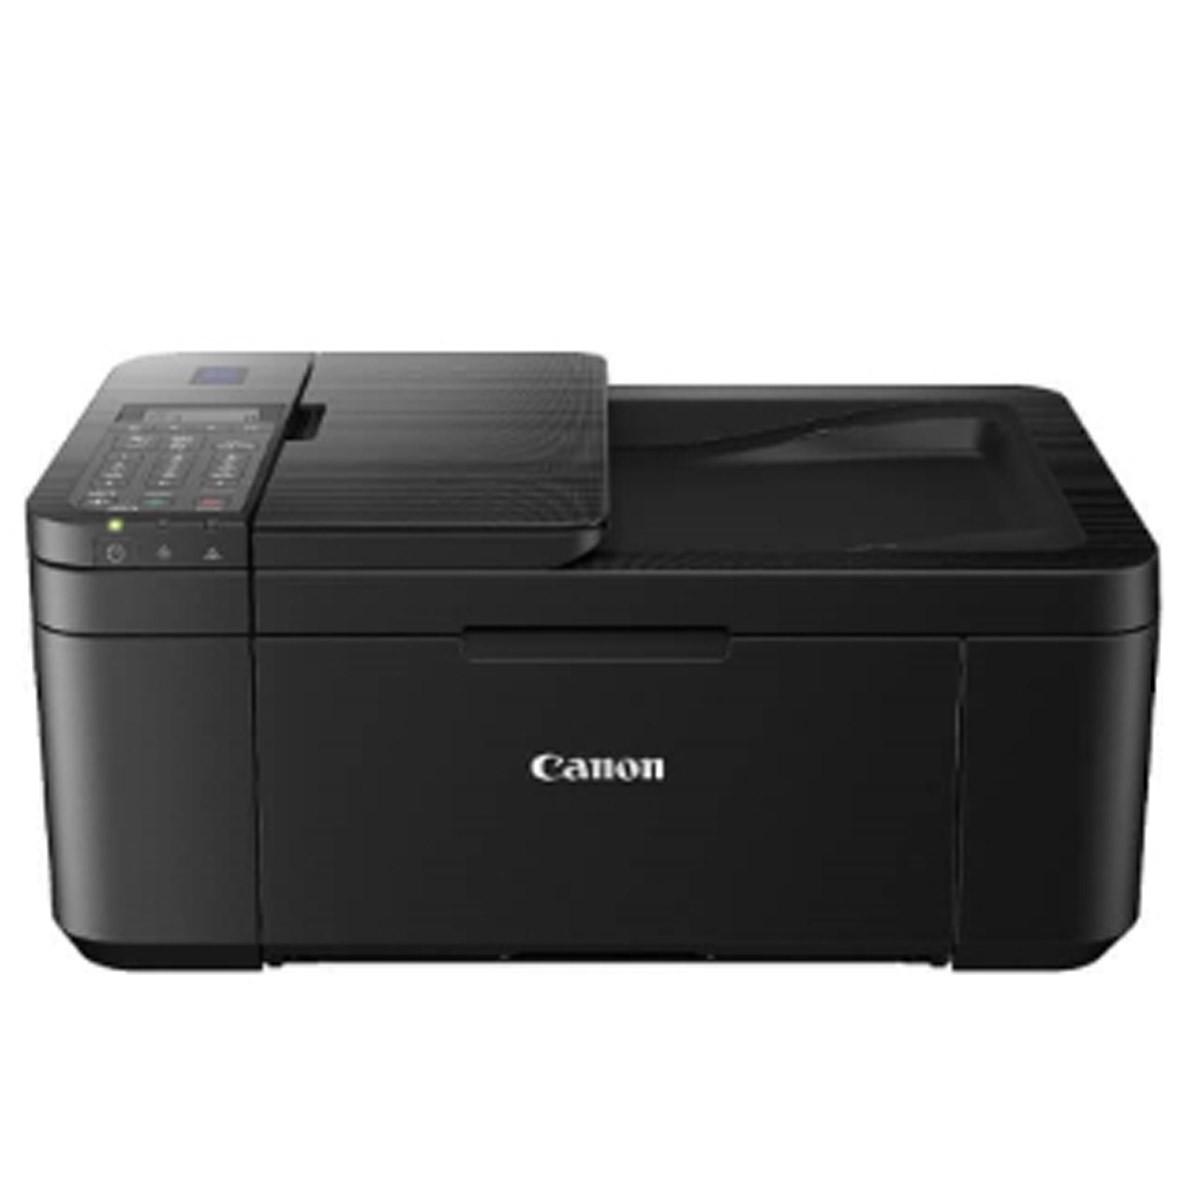 Impressora Canon Pixma E4210 | Multifuncional Jato de Tinta com Conexão Wi-fi